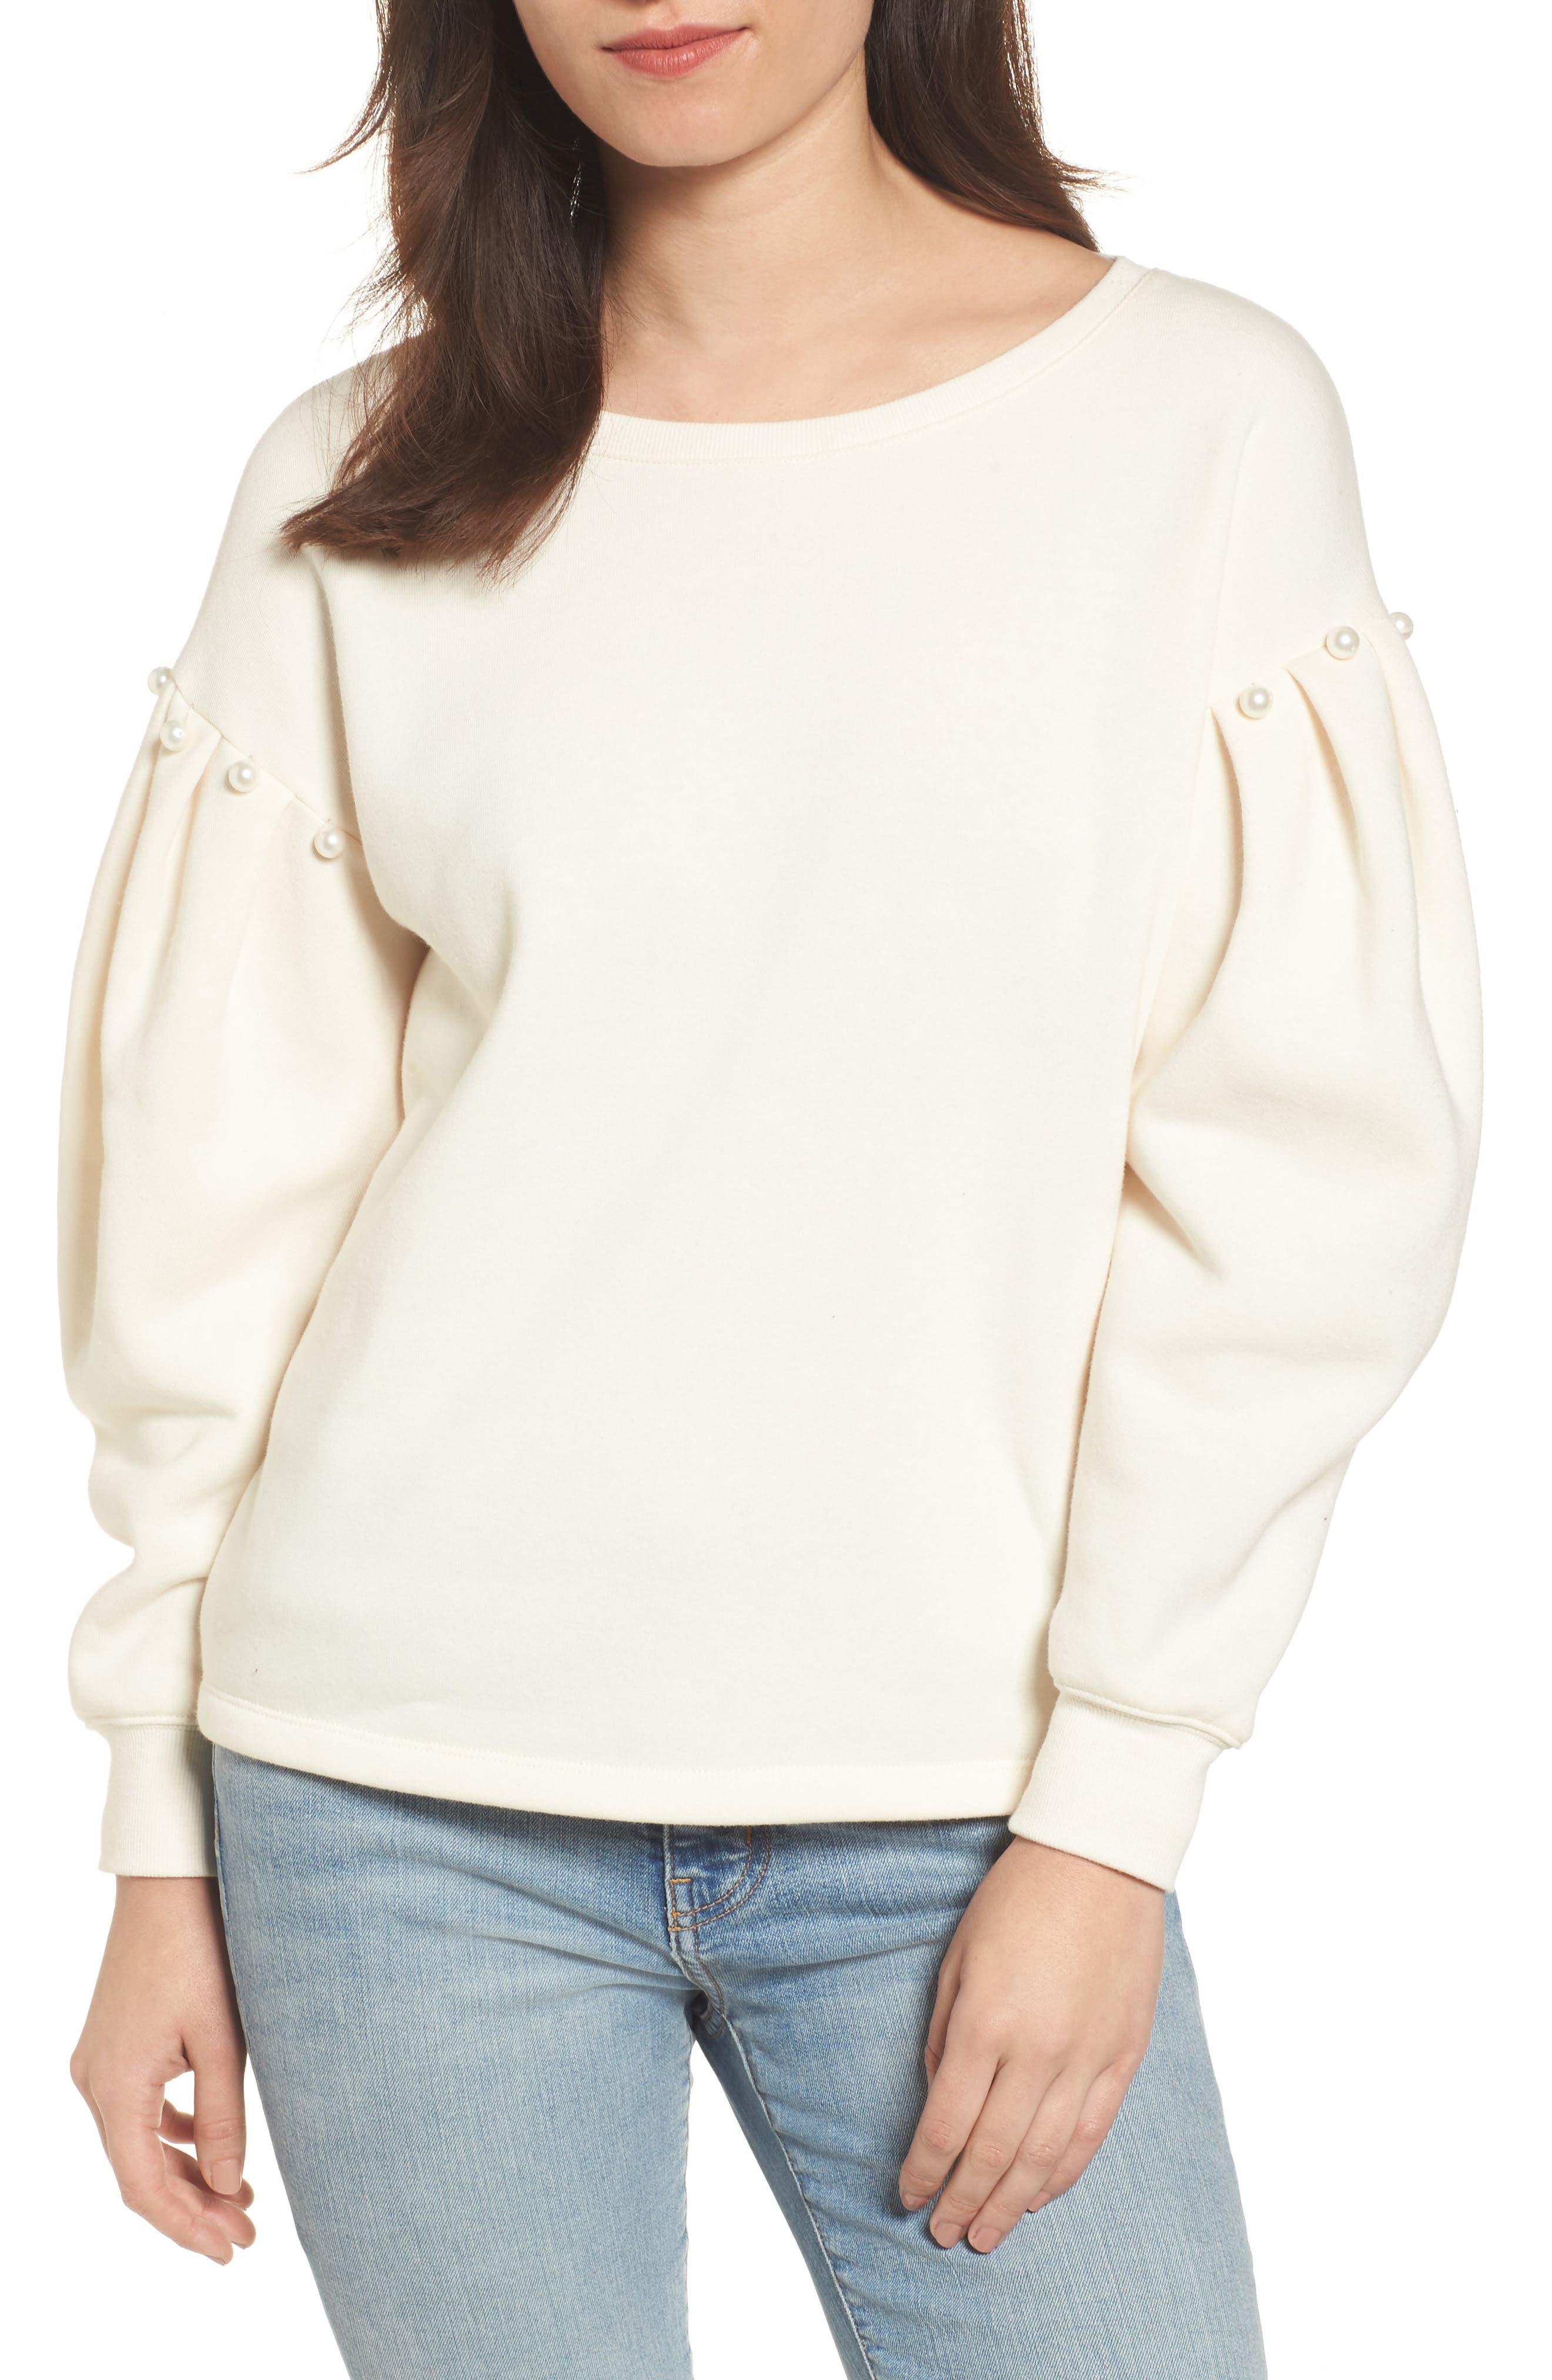 Ellison Sweatshirt,                             Main thumbnail 1, color,                             Off White